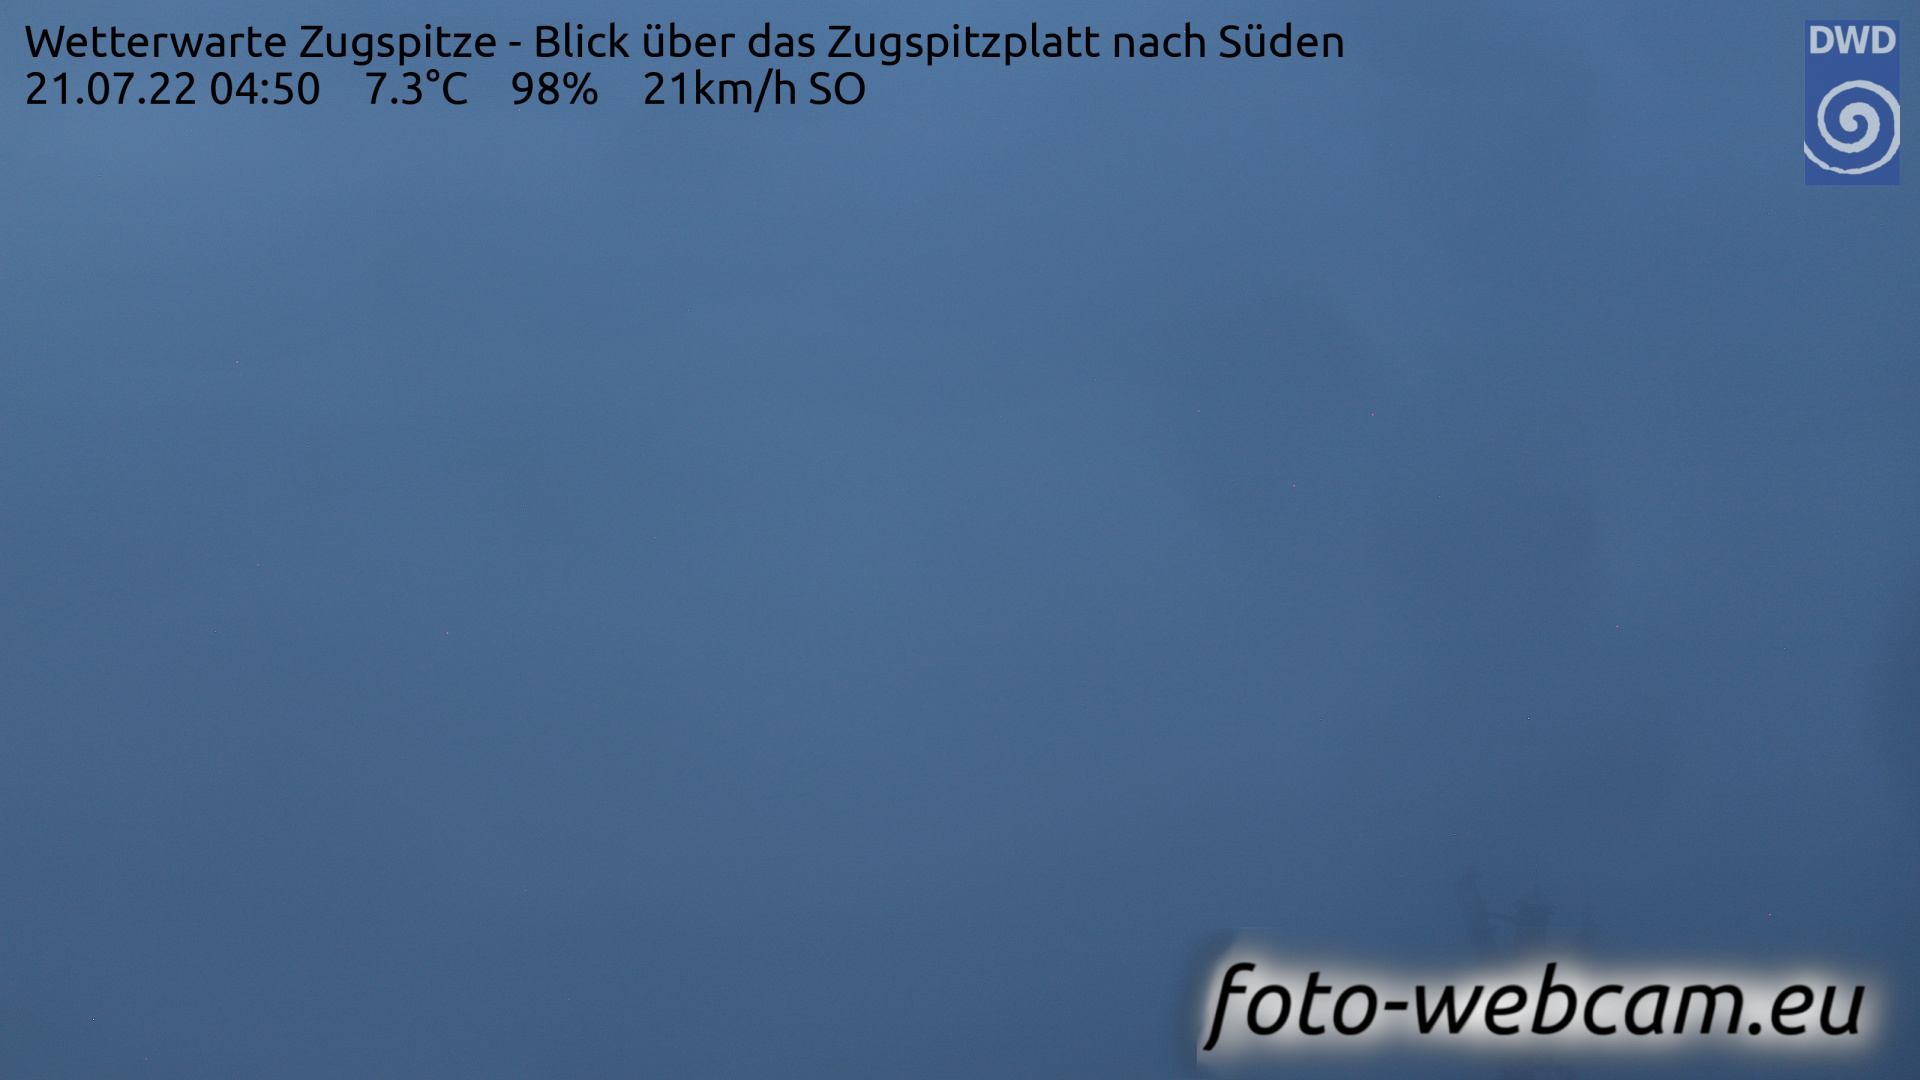 Zugspitze Fri. 04:58